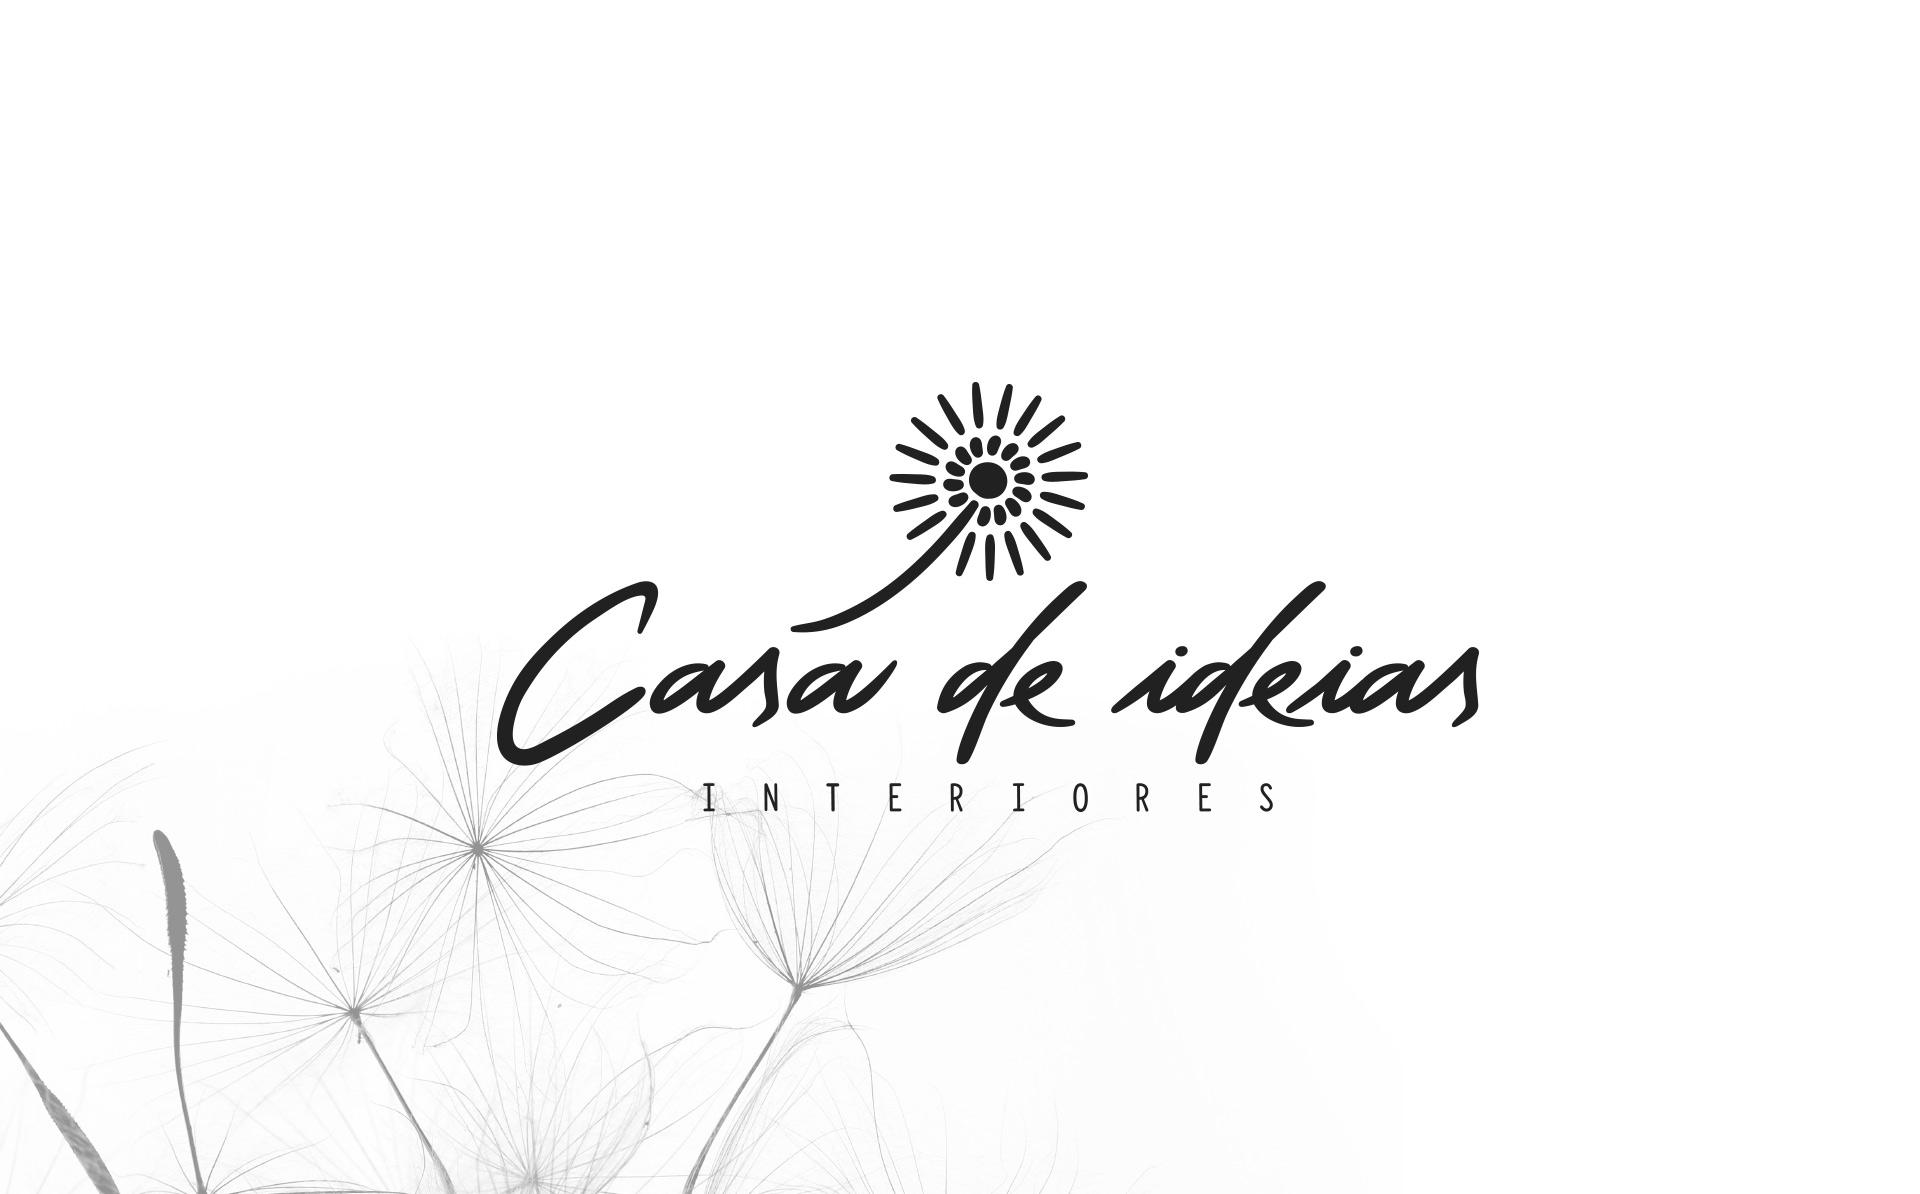 Inteligencia Marketing - Casa de Ideias Interiores – Identidade visual - CAsa-de-ideias_02